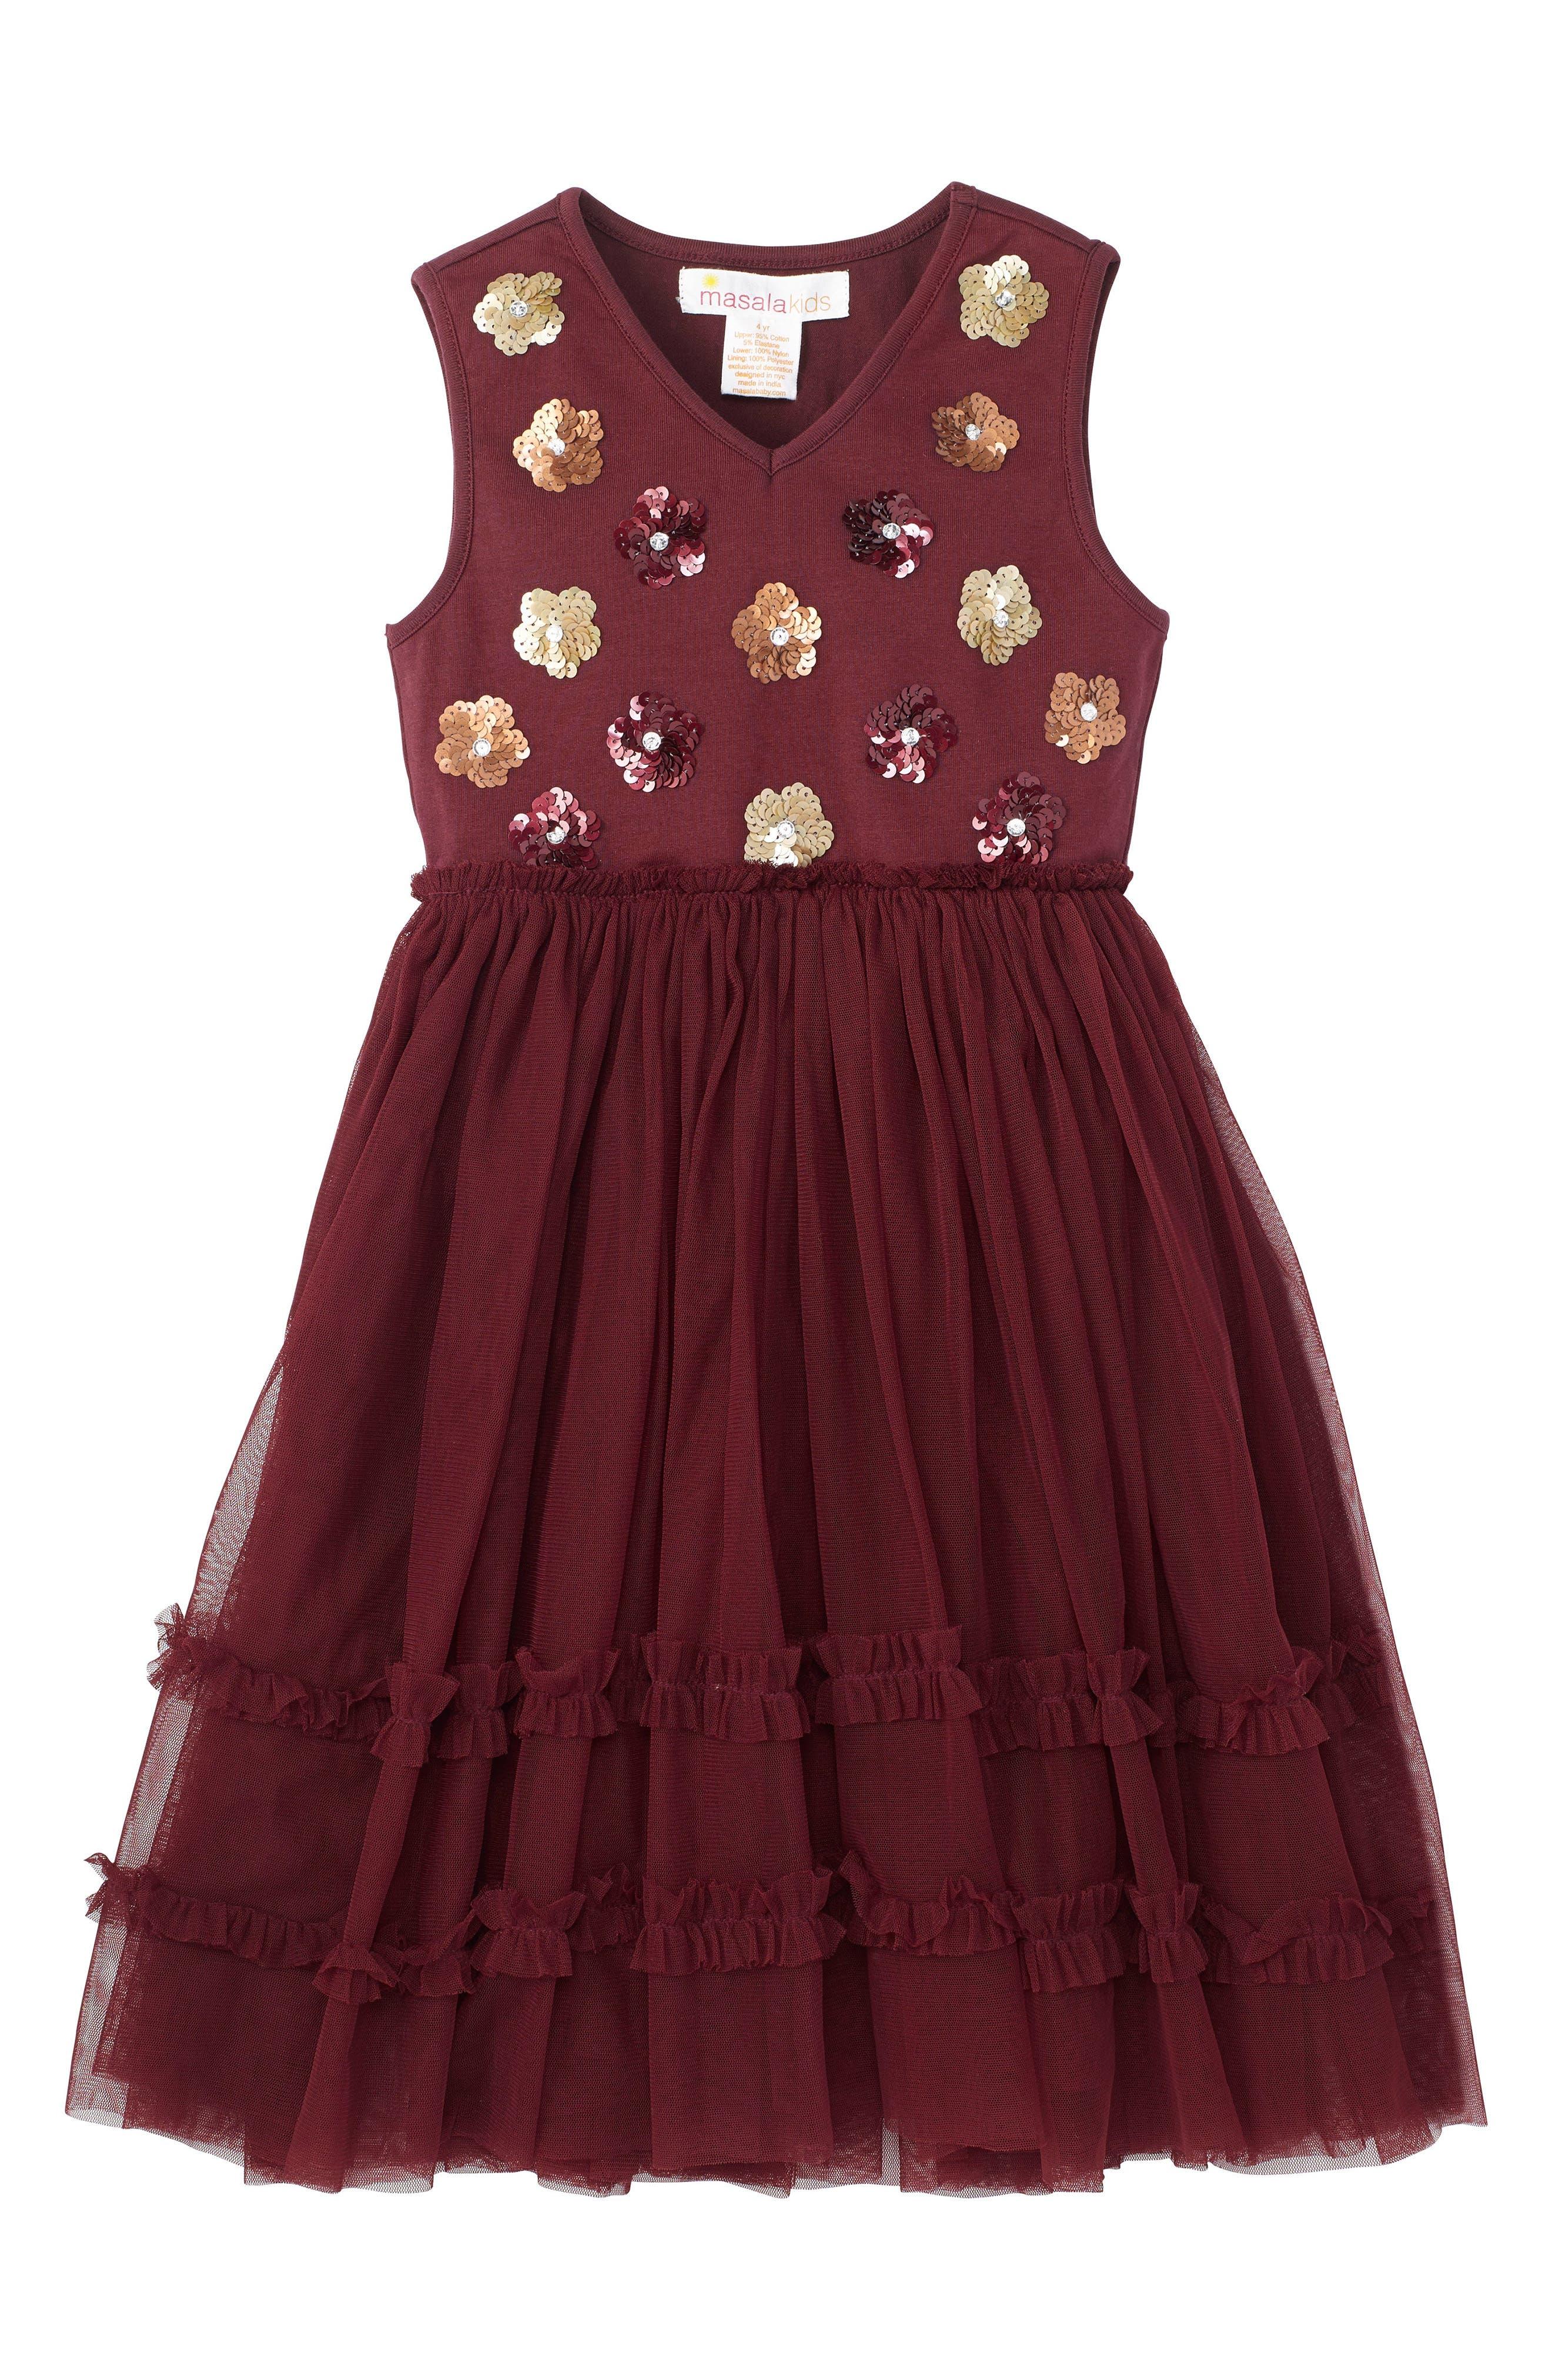 Alternate Image 1 Selected - Masalababy Liana Dress (Toddler Girls, Little Girls & Big Girls)